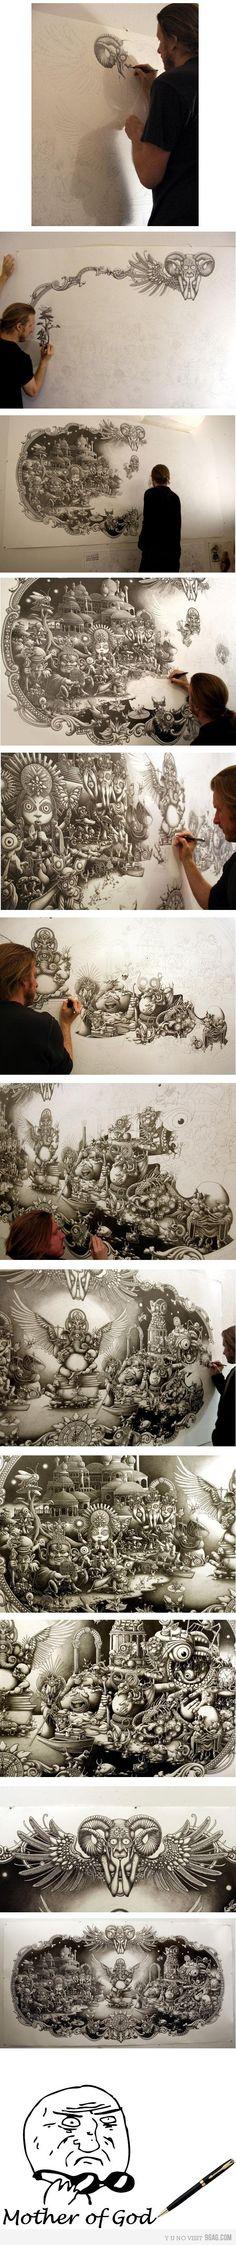 Please violate my walls   Awesome pen drawings by Joe Fenton  visit his site: http://joefentonart.com/